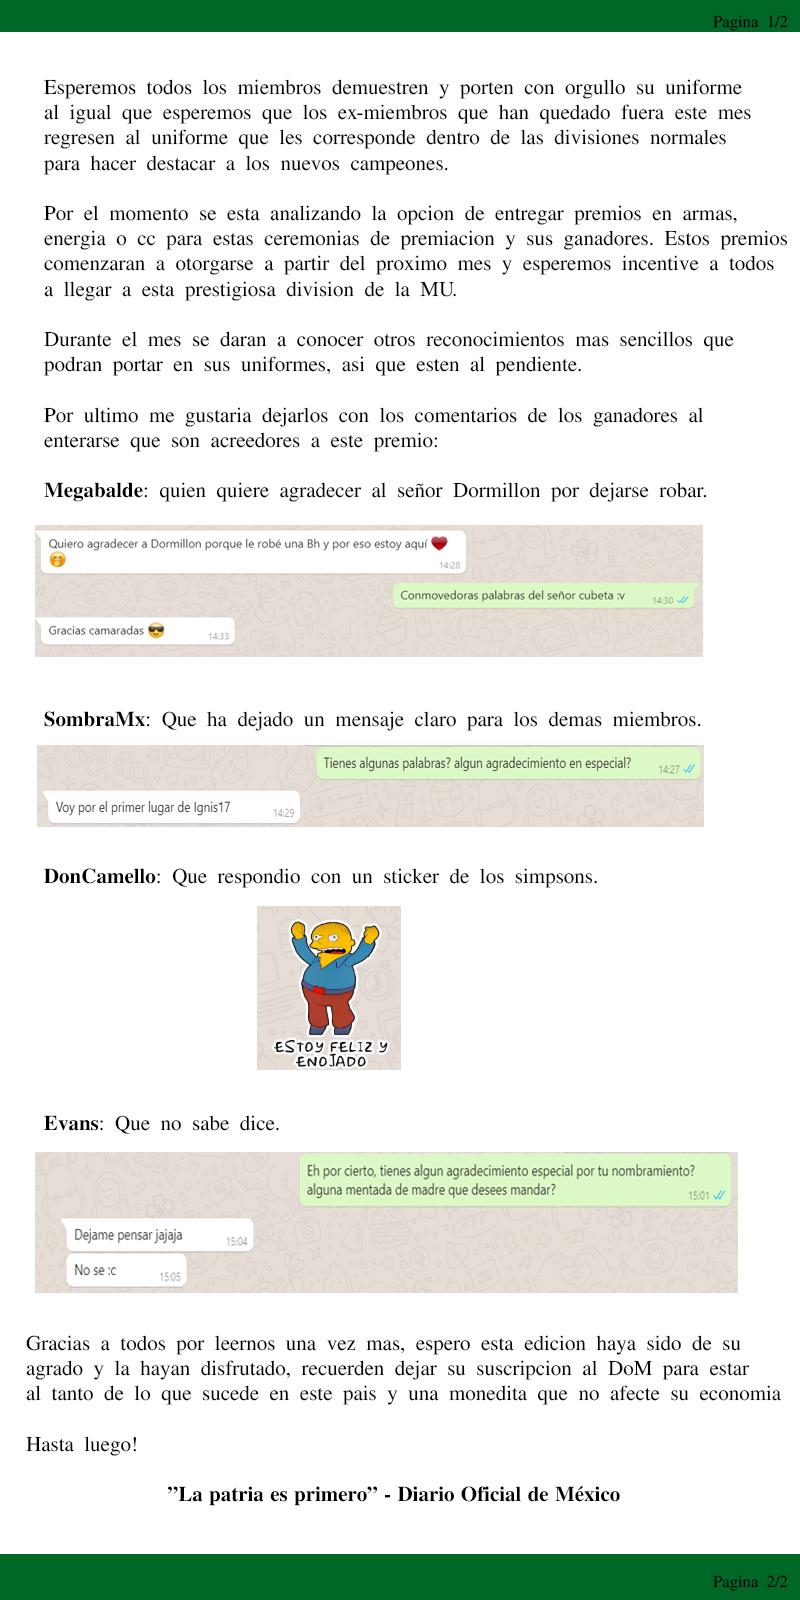 https://i.ibb.co/4Zfv65L/Nuevos-Teotl-Marzo-2.jpg